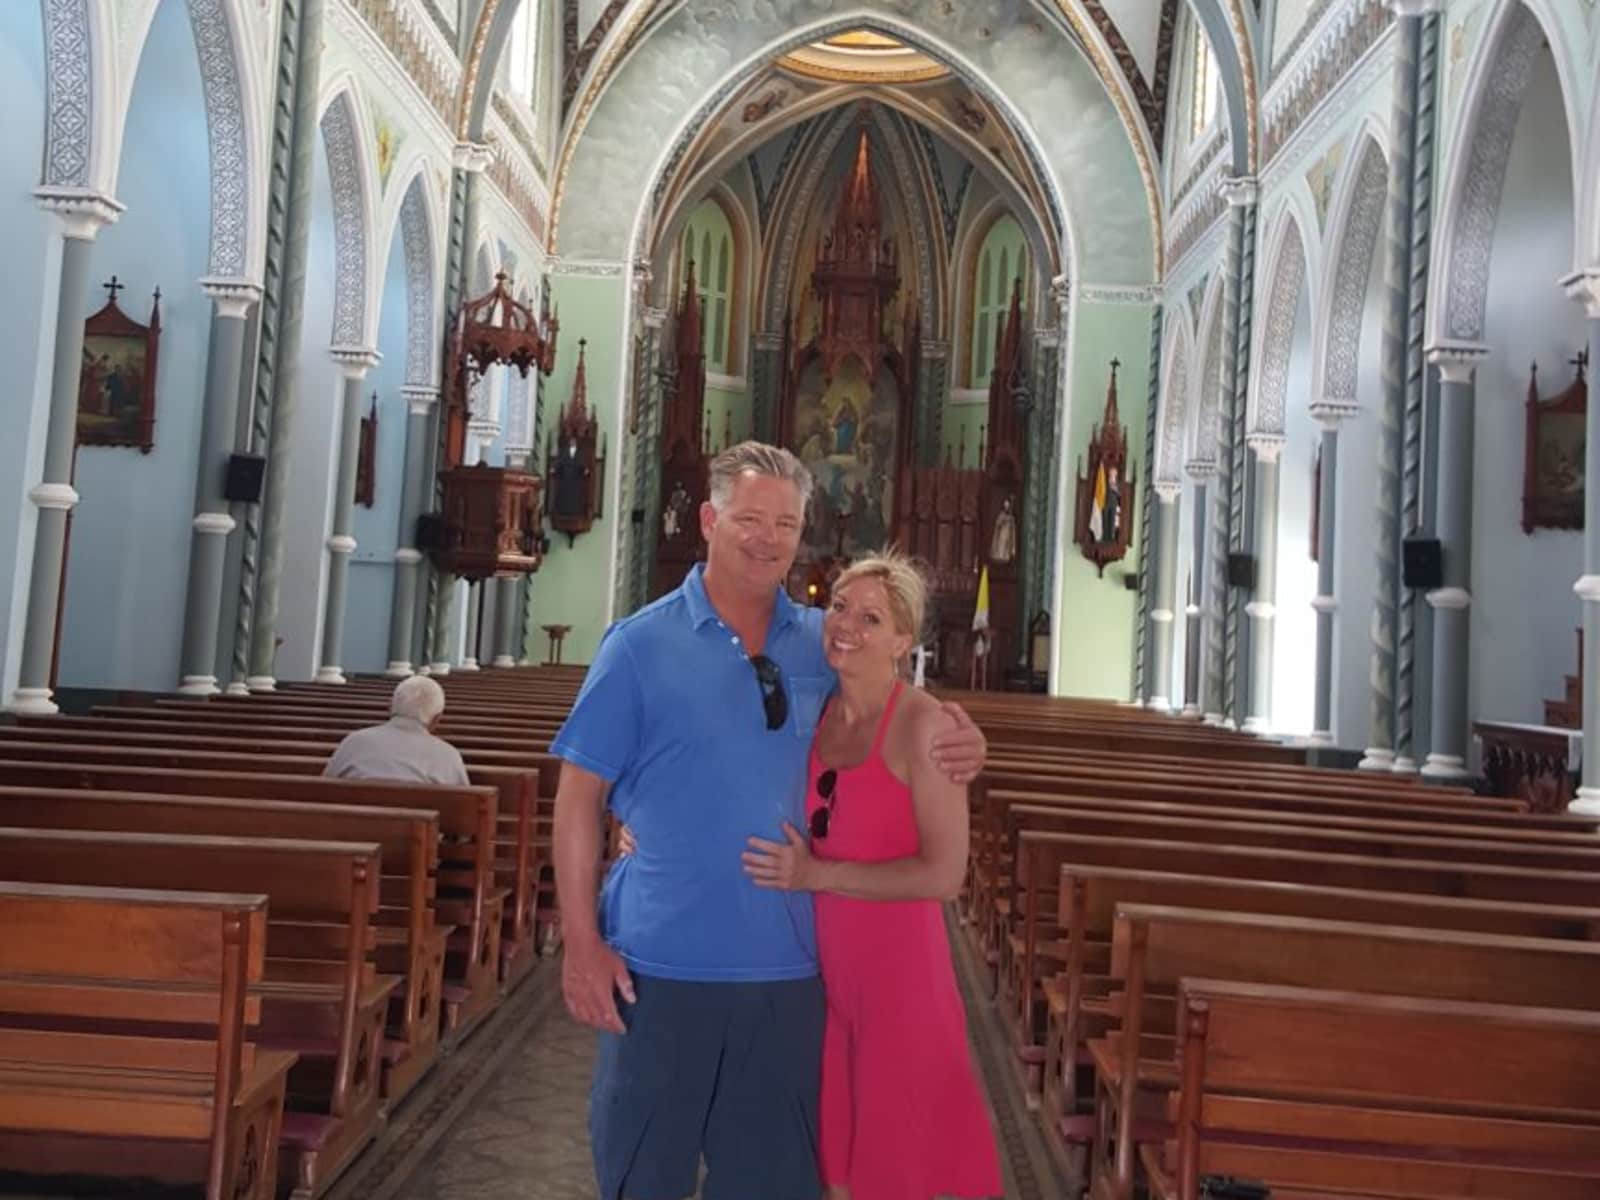 Lisa & Dave from Minneapolis, Minnesota, United States